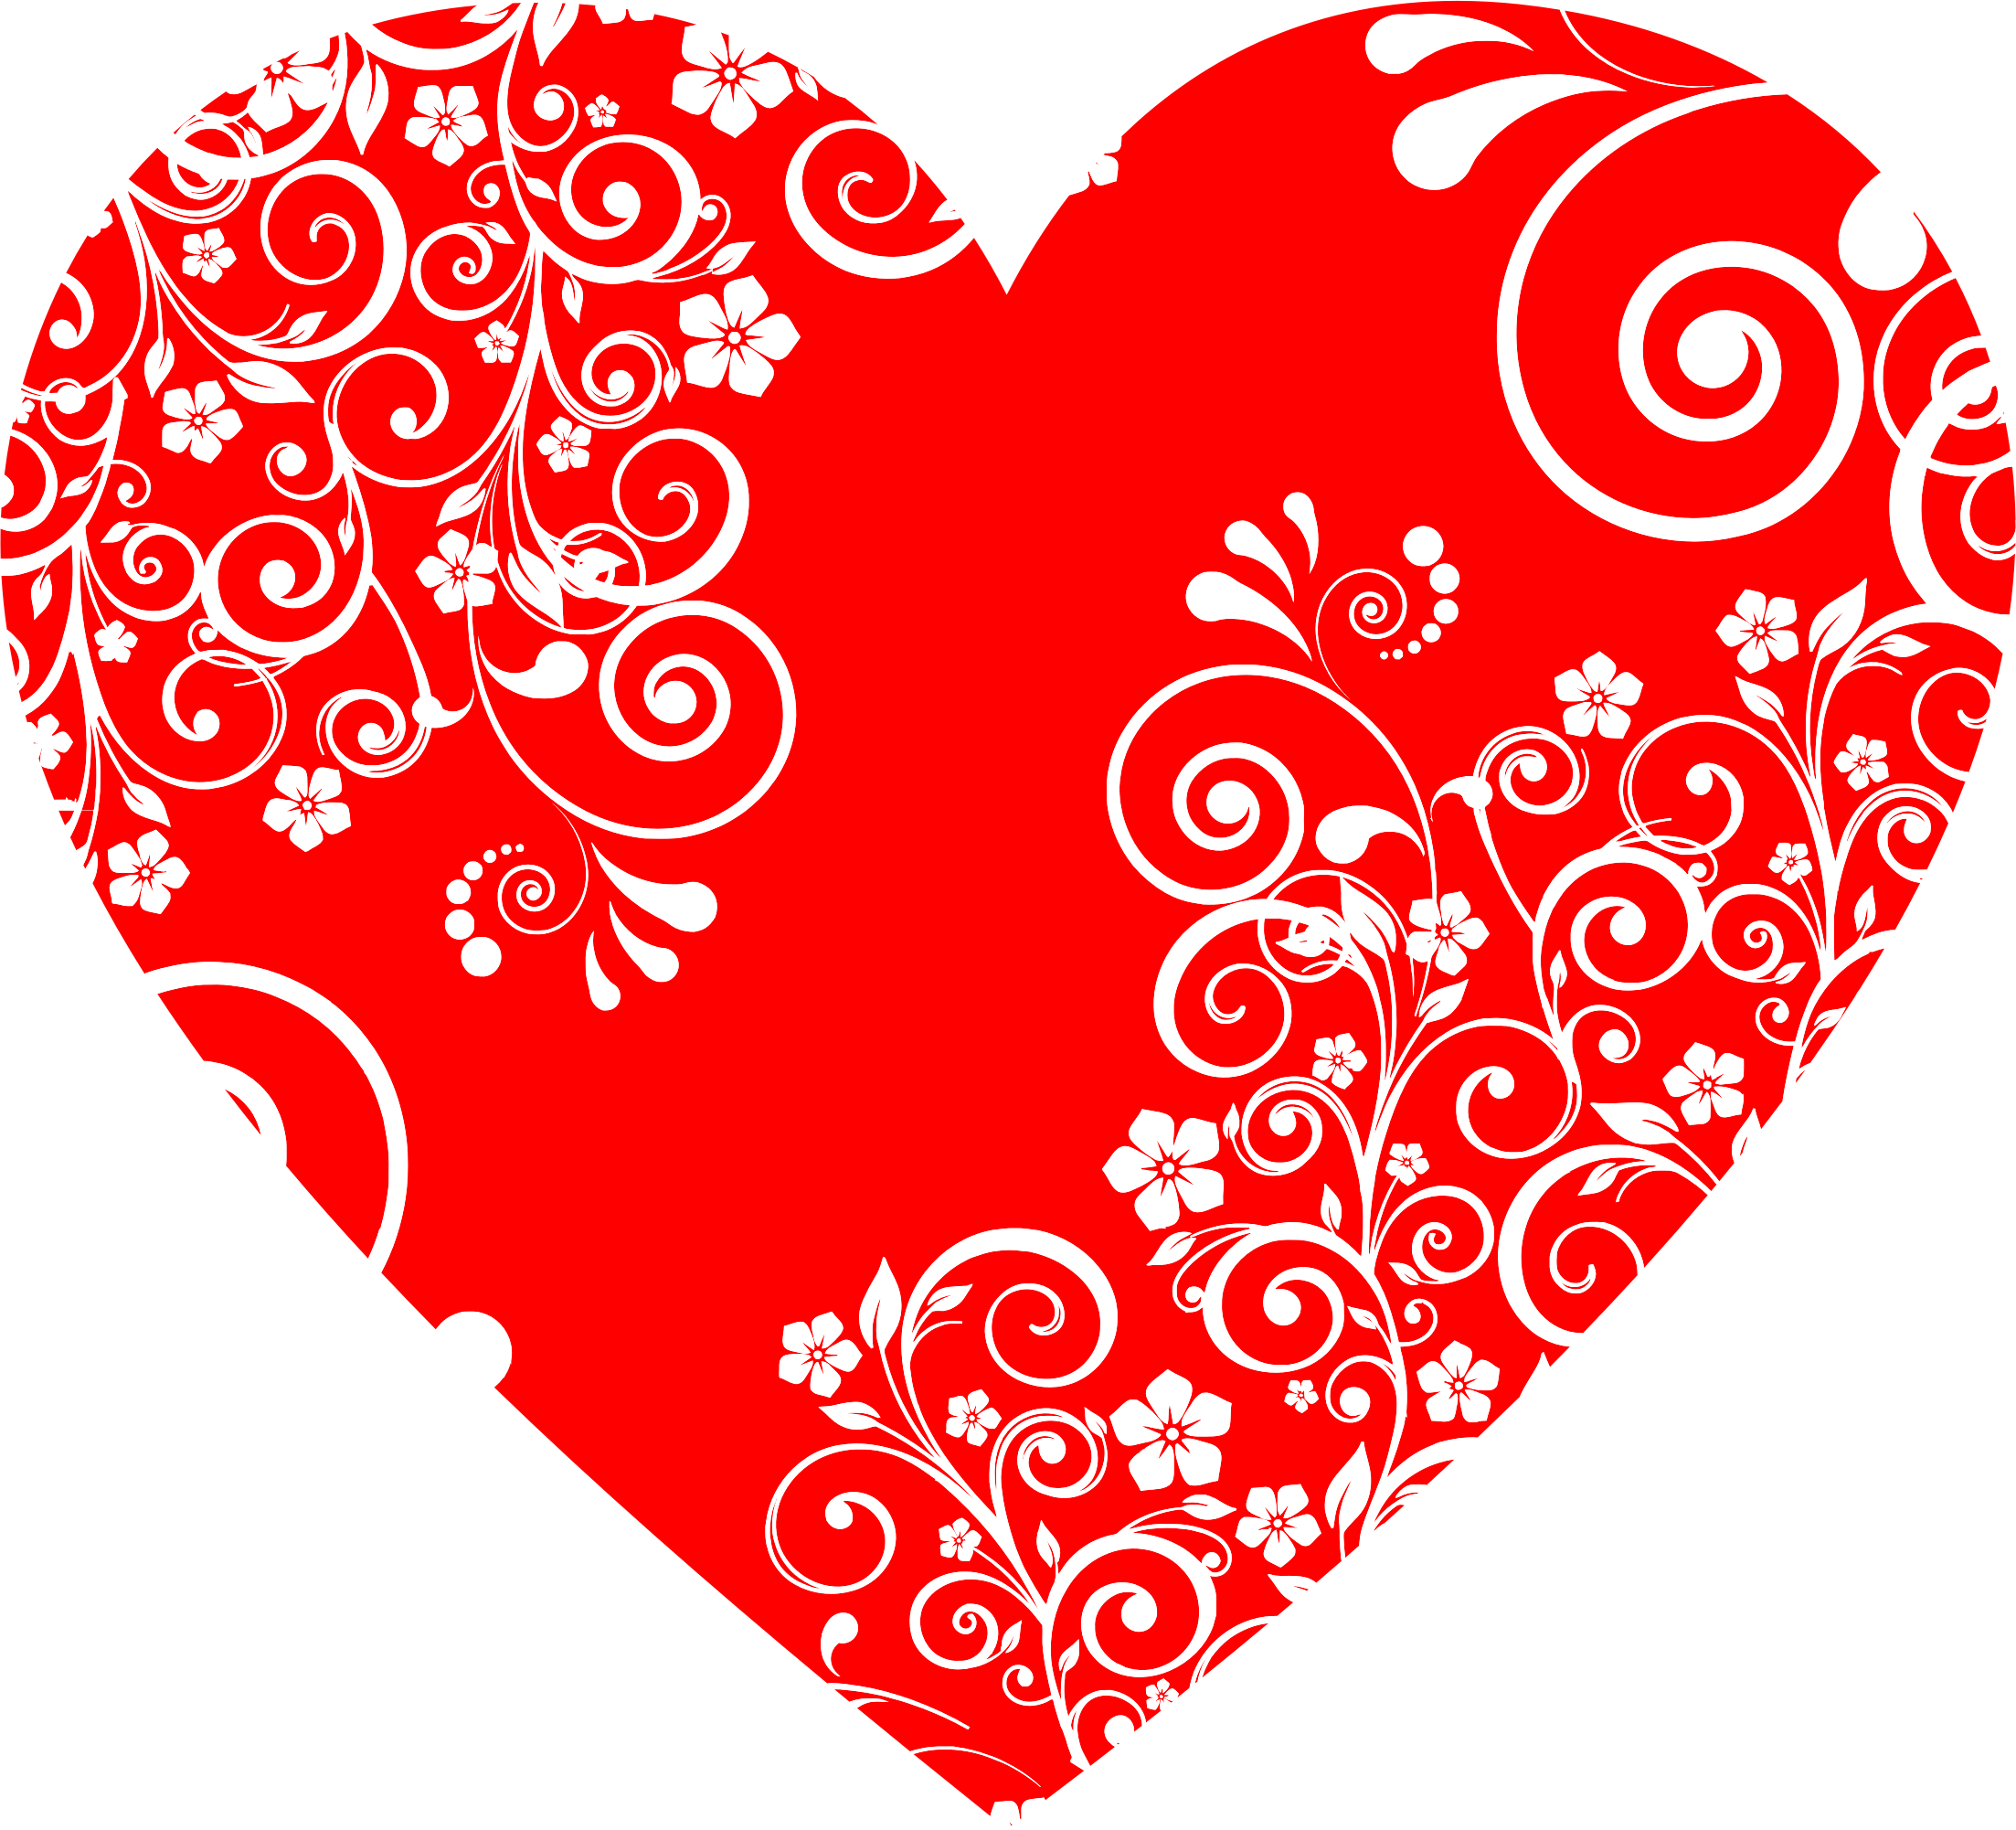 Floral big image png. Flourish clipart heart